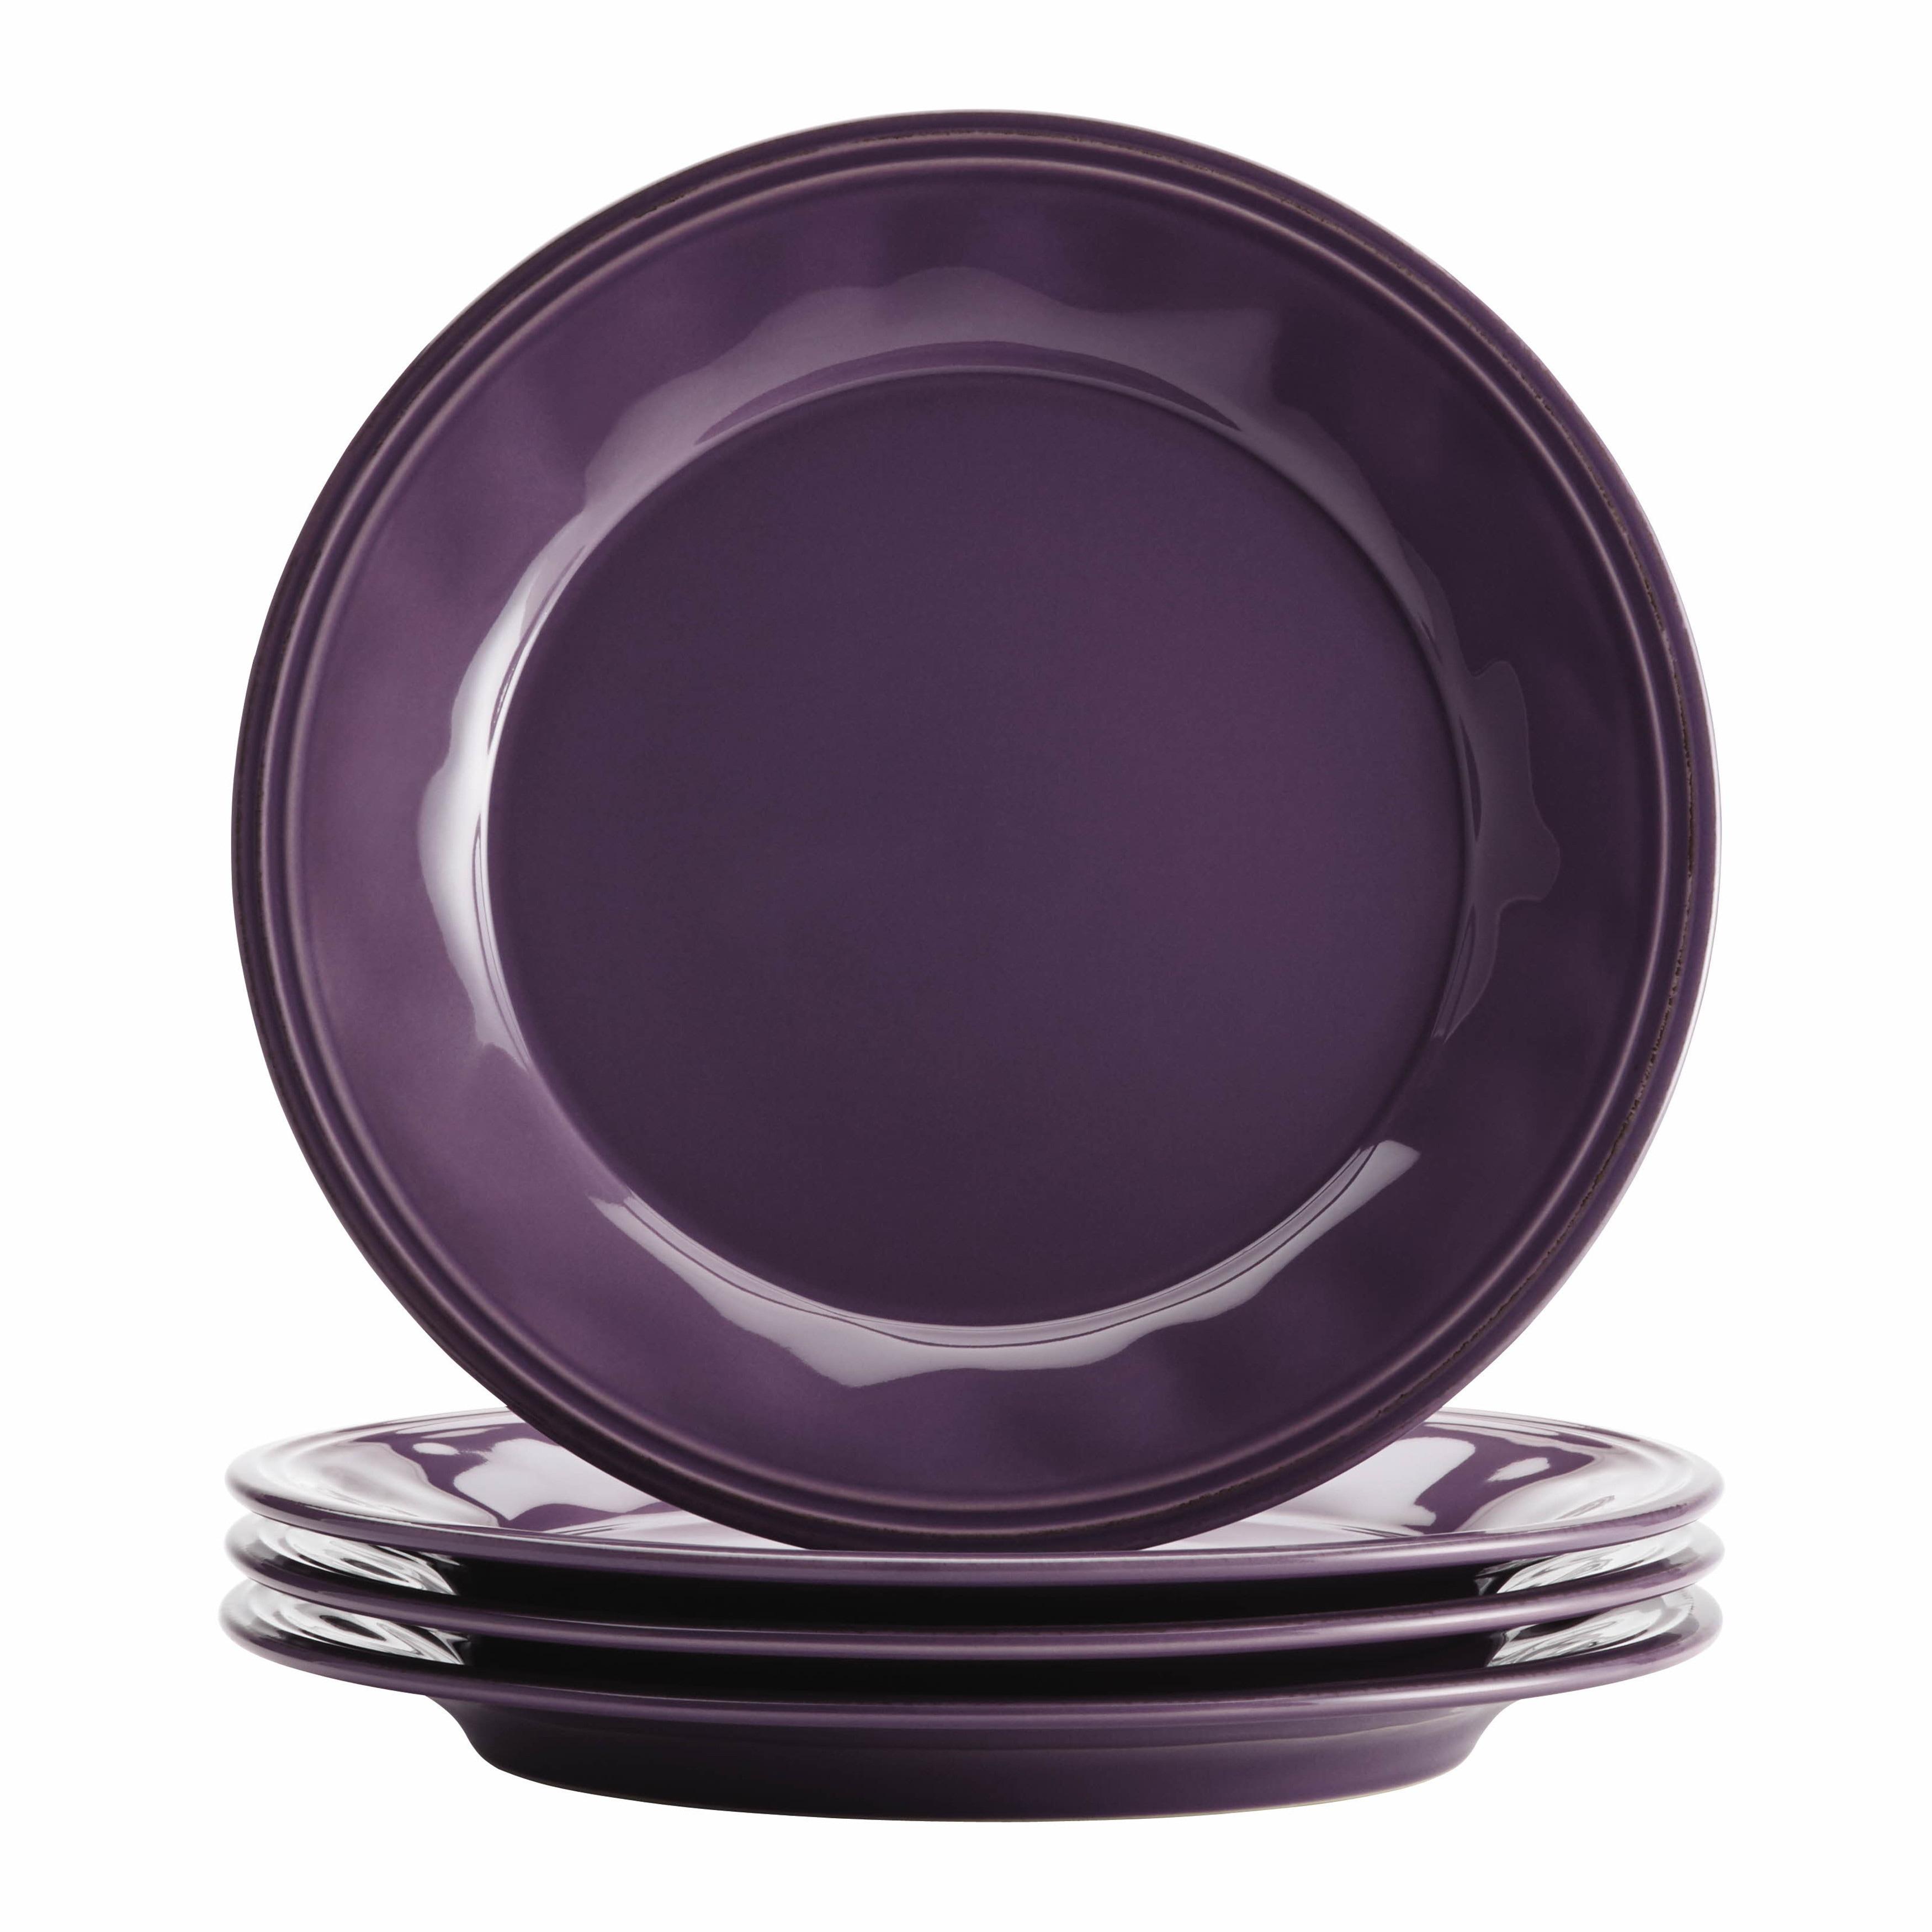 Shop Rachael Ray Cucina Dinnerware 16-piece Lavender Purple Stoneware Dinnerware Set - On Sale - Free Shipping Today - Overstock.com - 10111188  sc 1 st  Overstock & Shop Rachael Ray Cucina Dinnerware 16-piece Lavender Purple ...